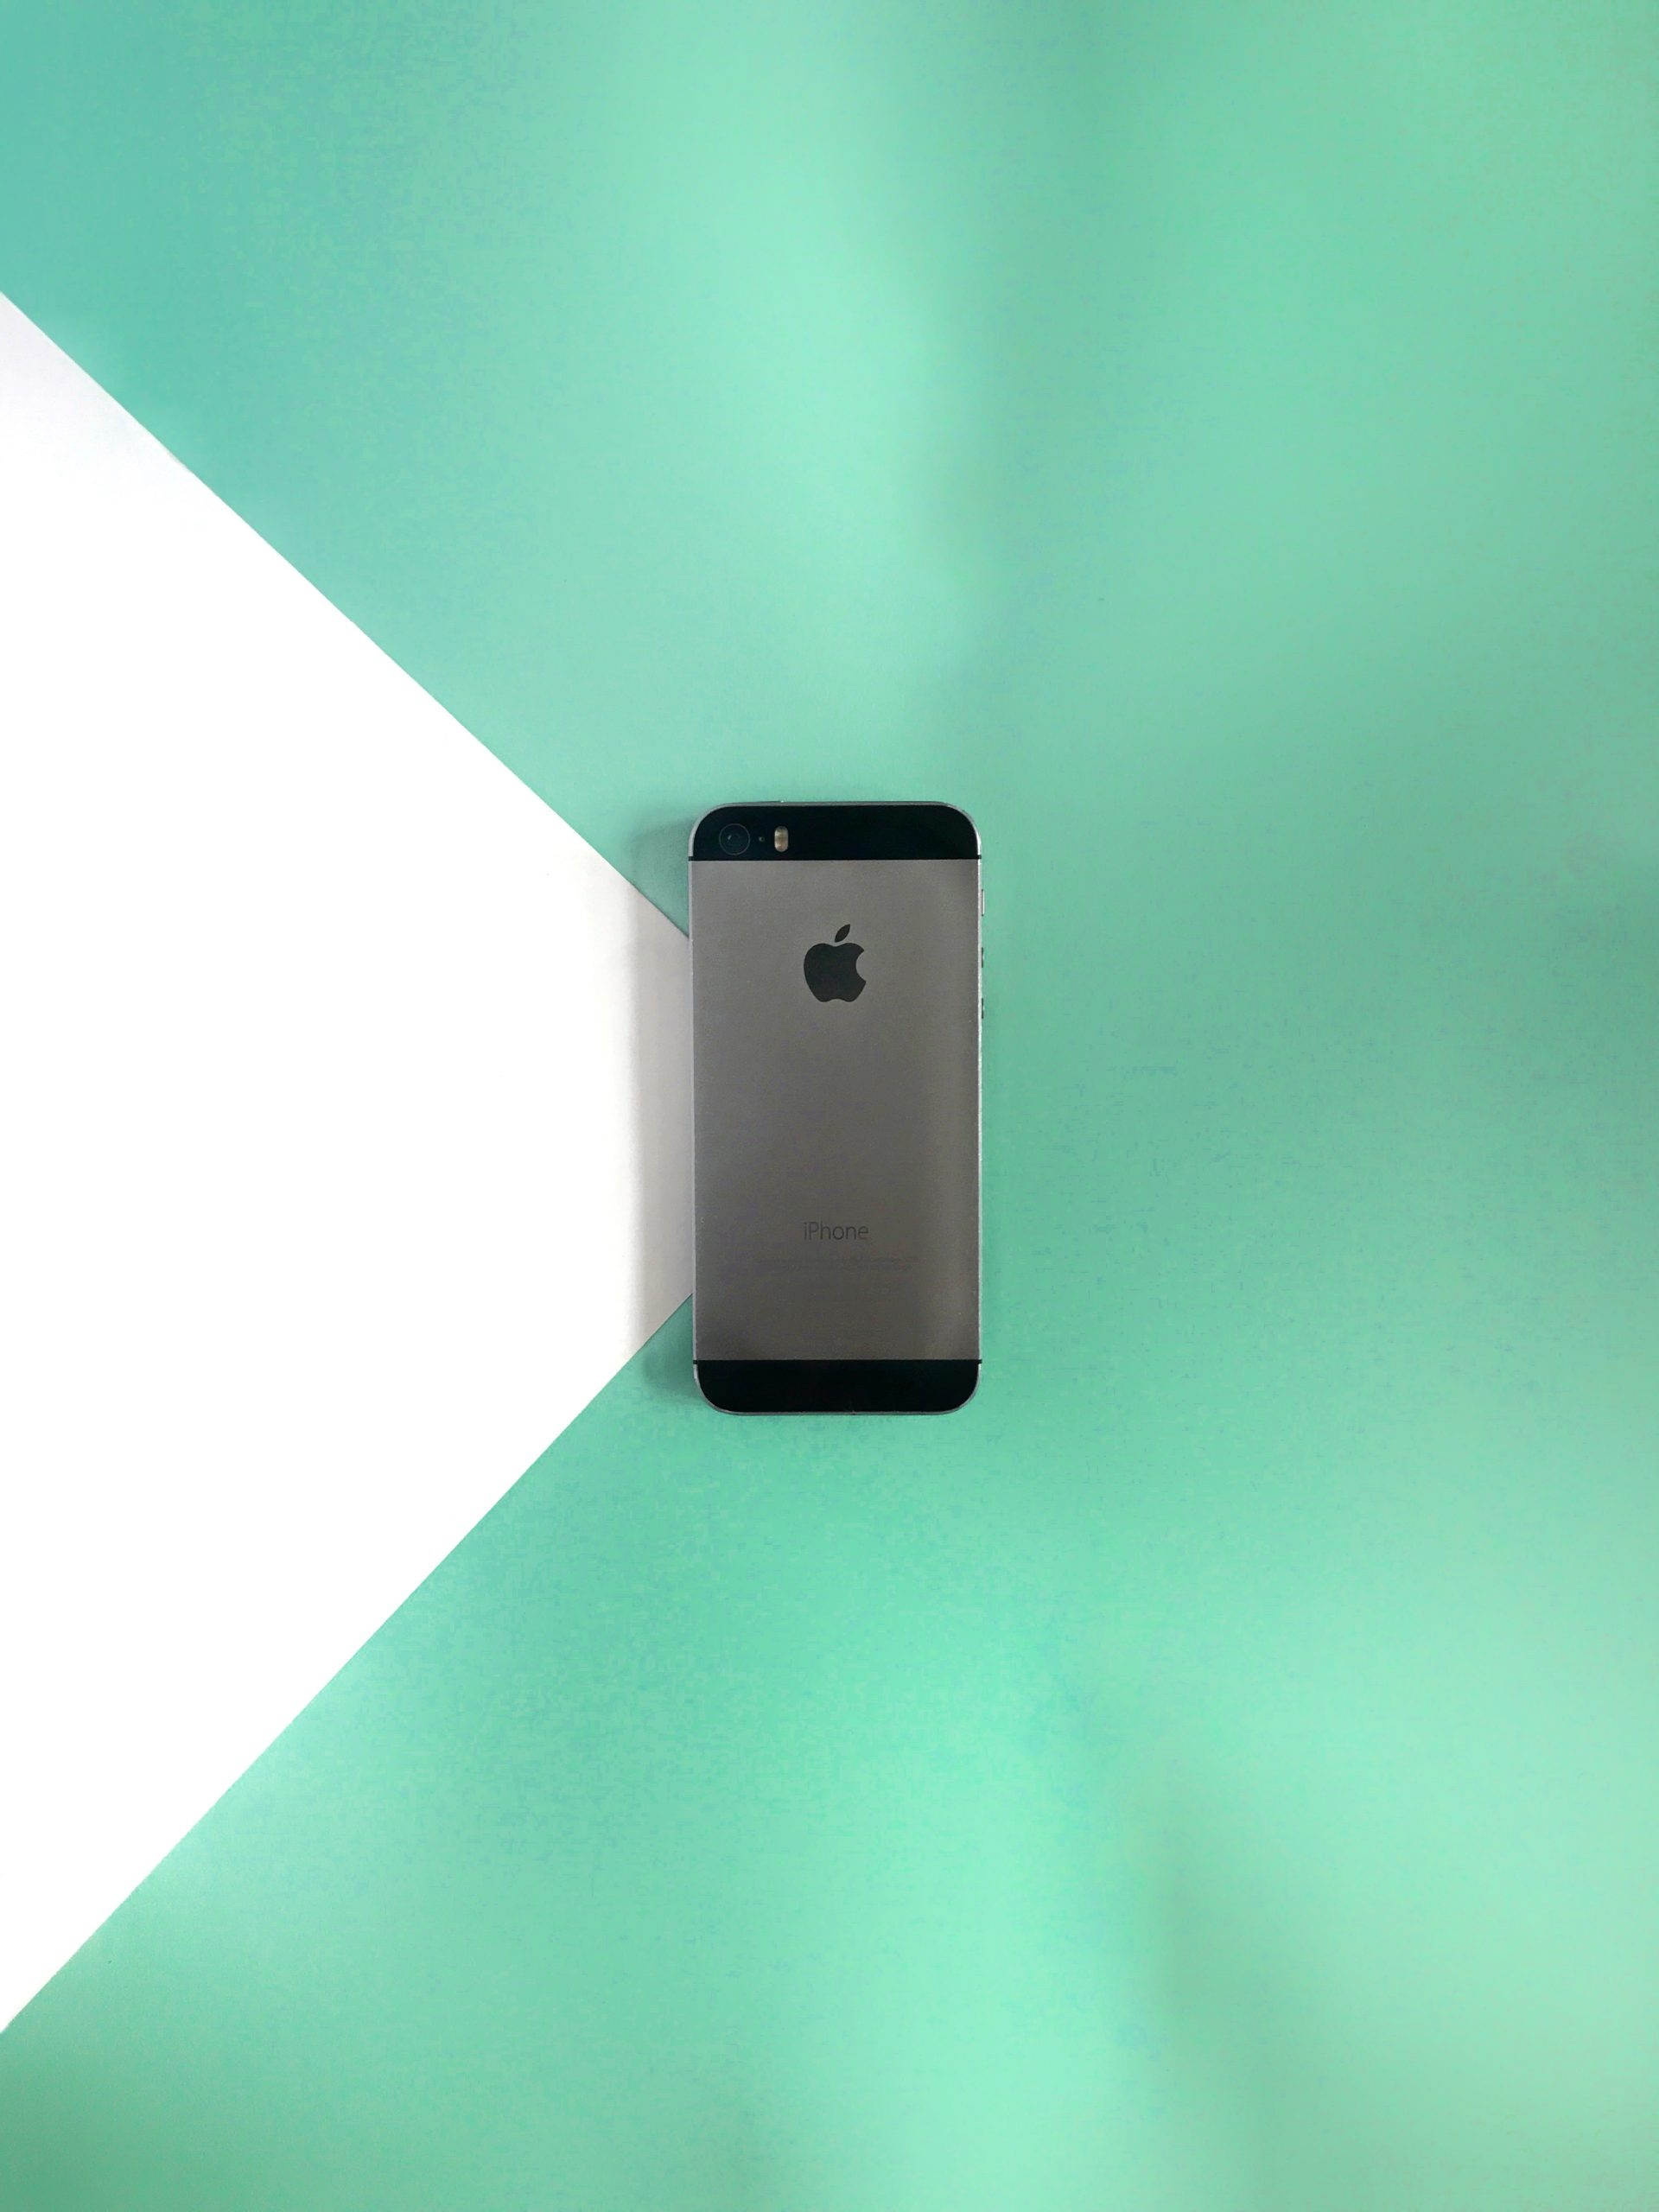 iPhone Flatlay